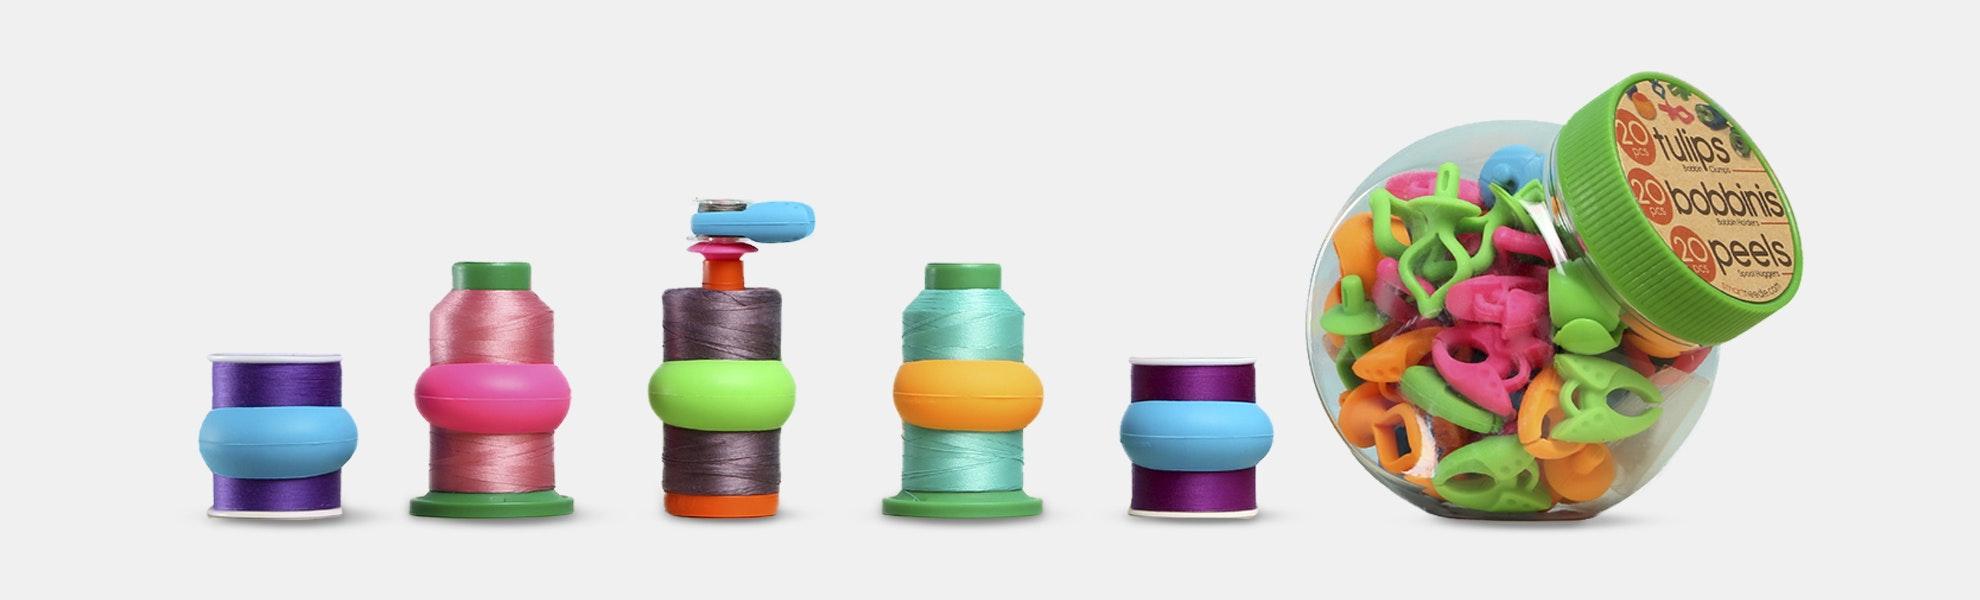 60-Piece Mixed Notions Jar